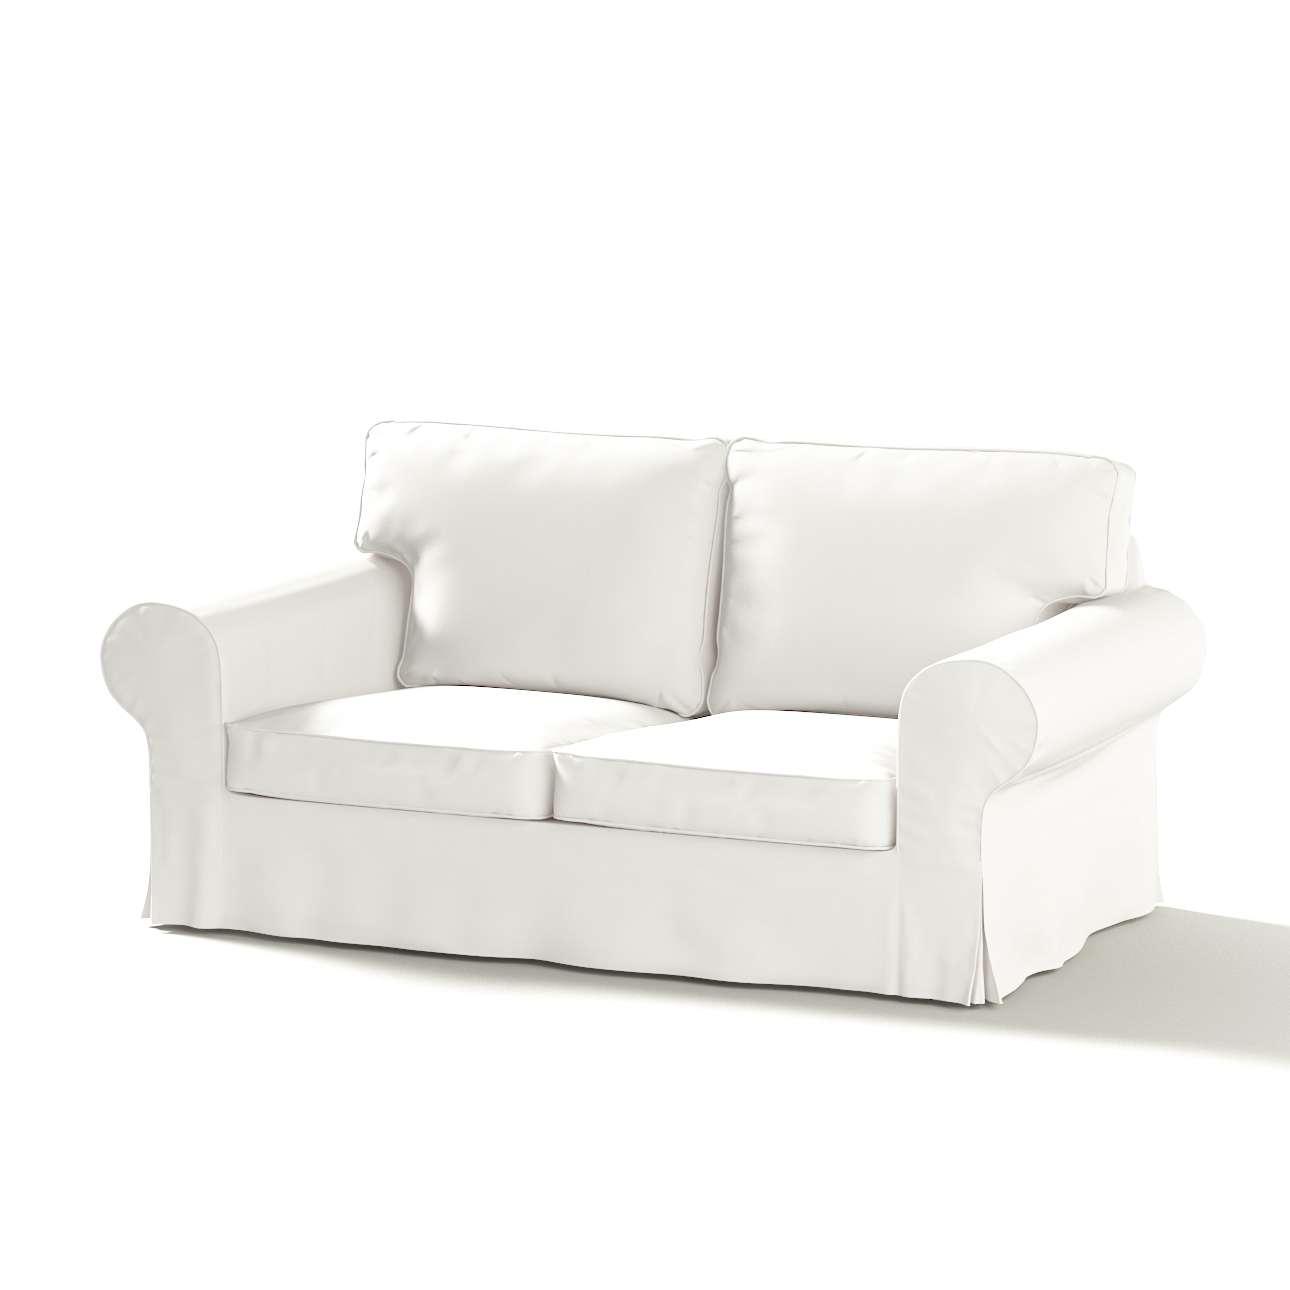 Ektorp 2 sæder sovesofa gammel model<br/>Bredde ca 195cm Betræk uden sofa fra kollektionen Cotton Panama, Stof: 702-34